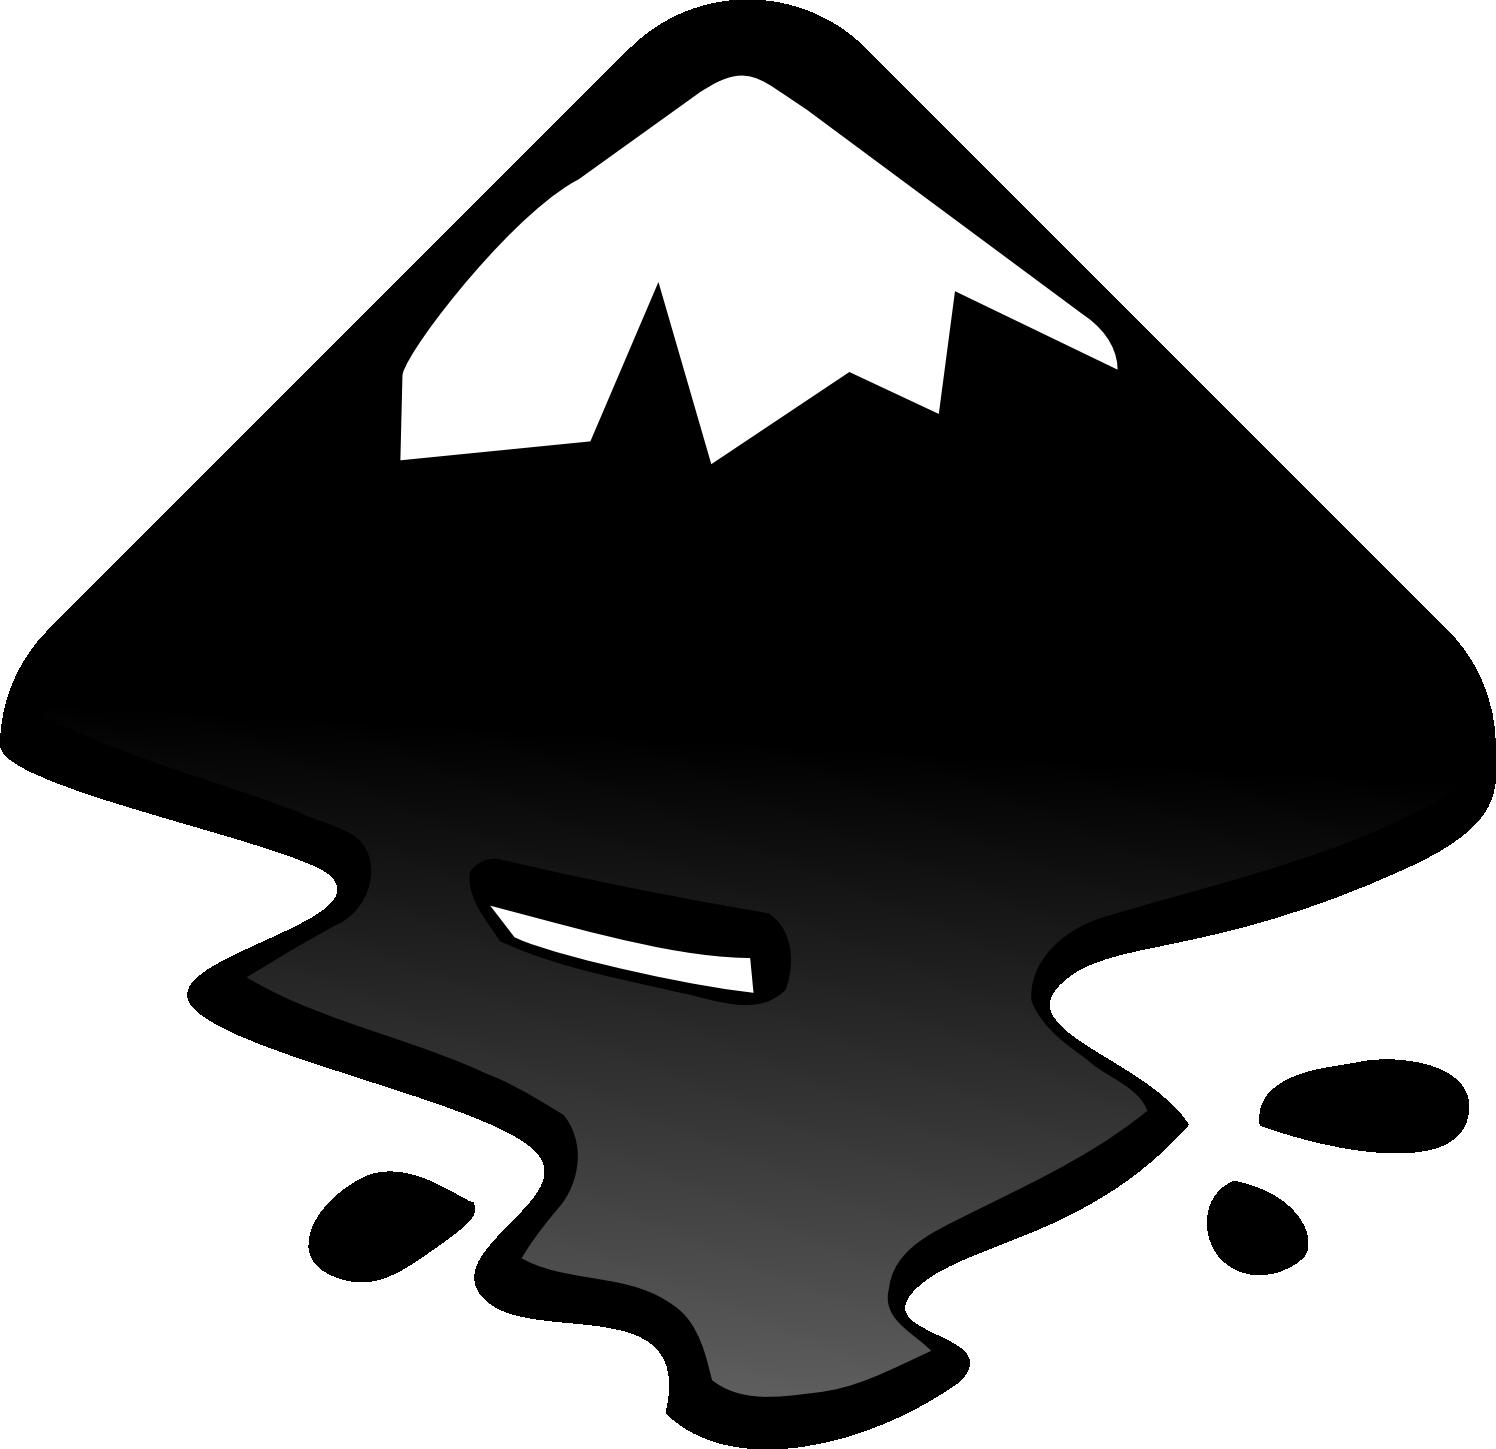 inkscape-logo-40.png?nocache=1309011547537